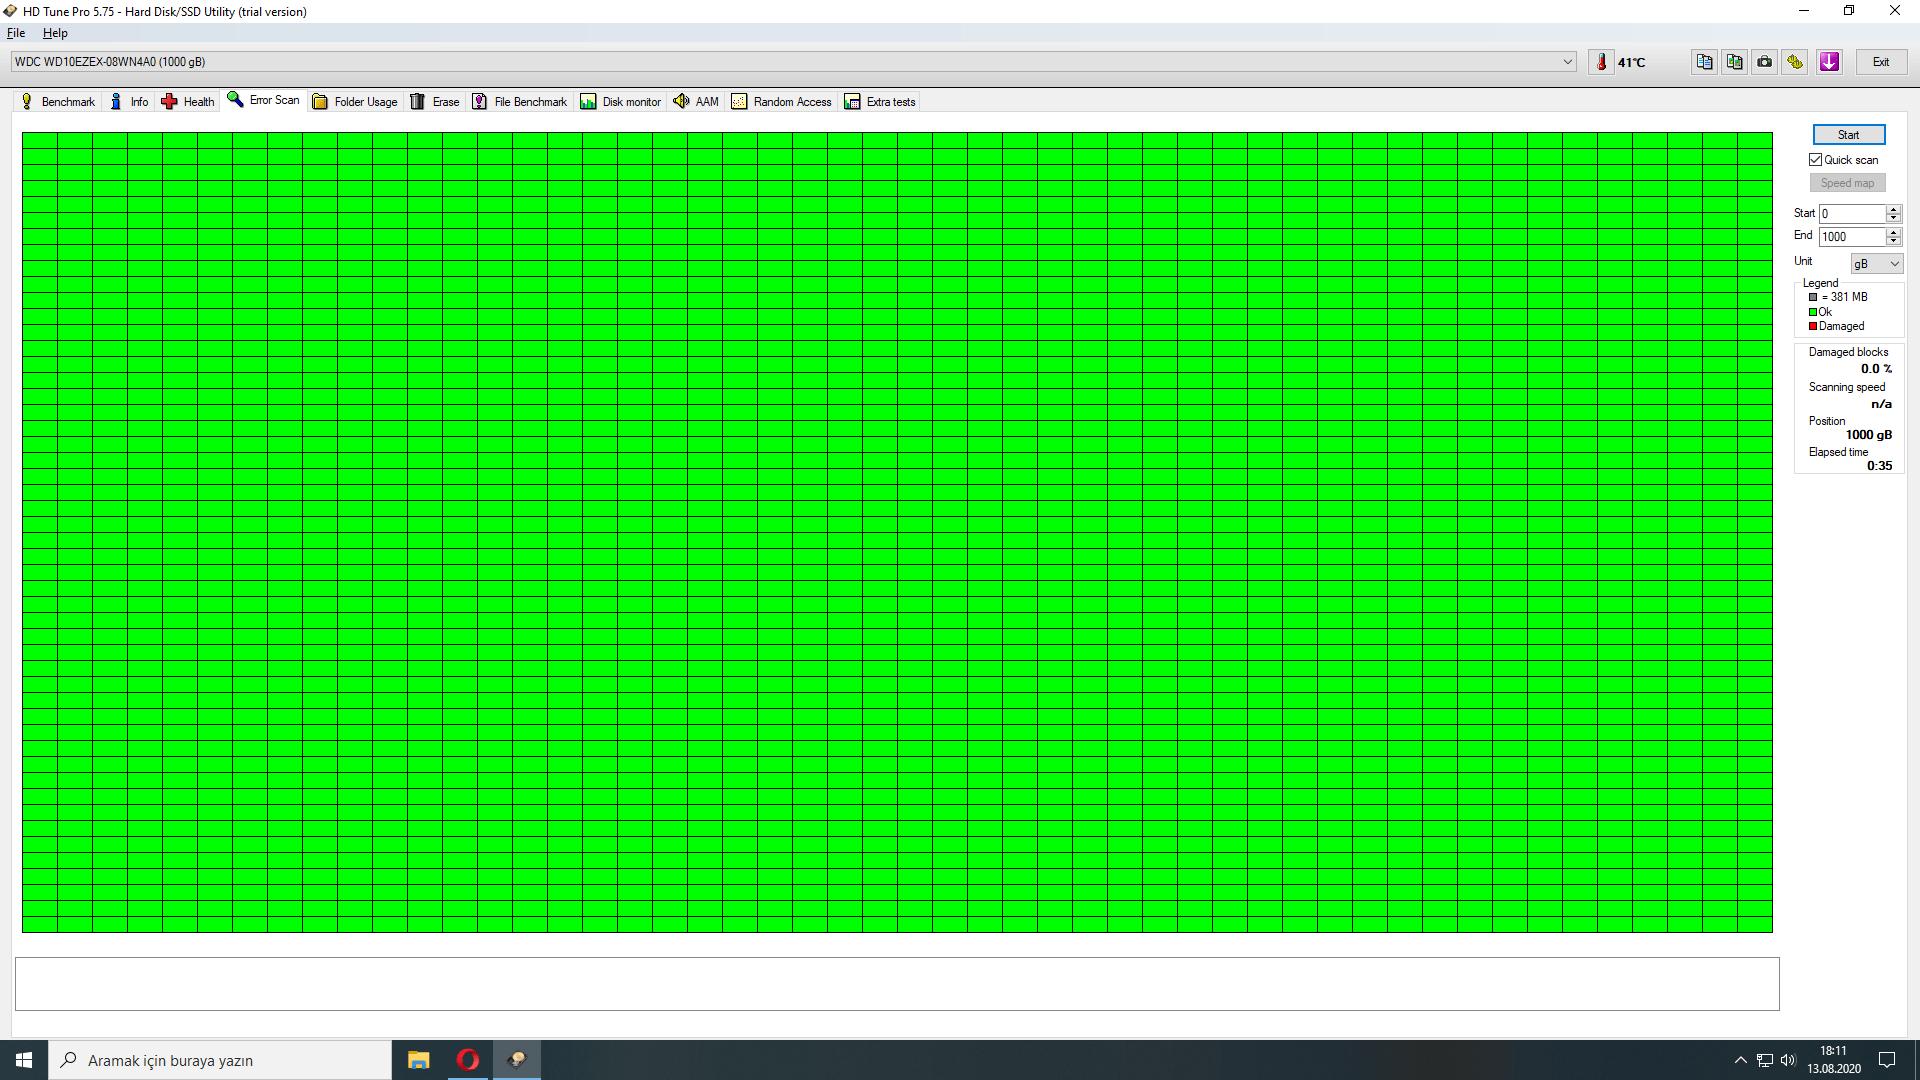 desktop-screenshot-2020-08-13-18-11-35-47-png.638188